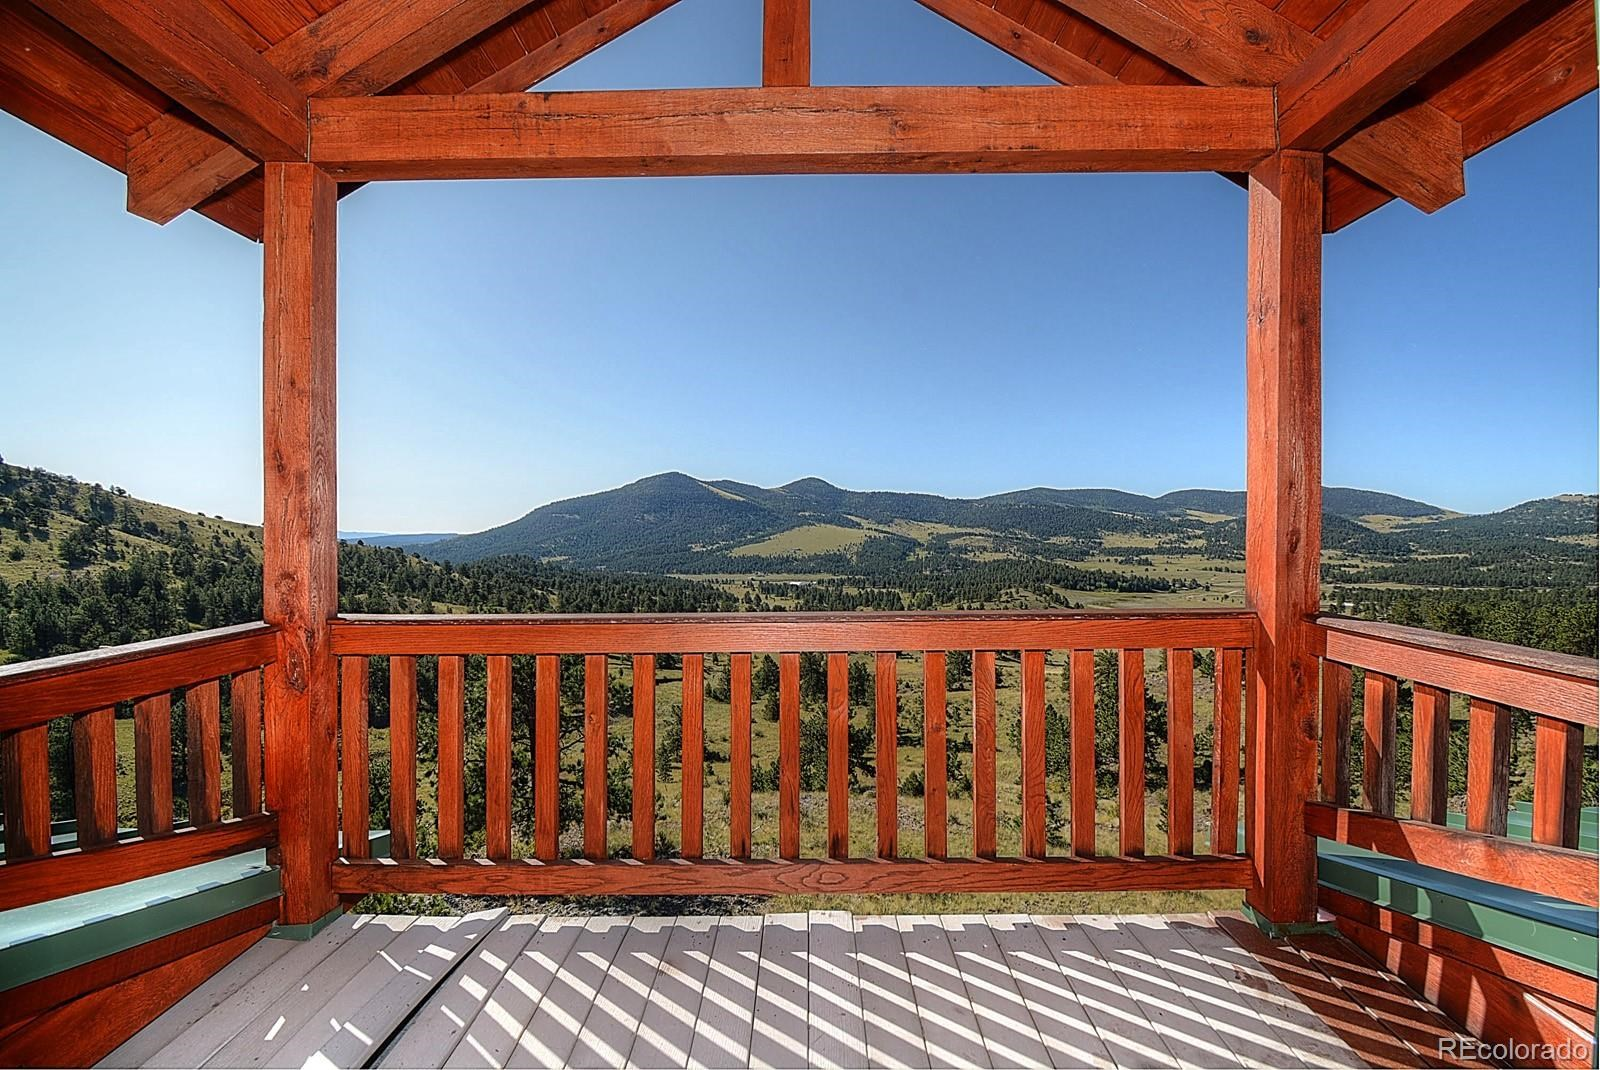 MLS# 8182693 - 22 - 396 Eagle Nest Trail, Guffey, CO 80820